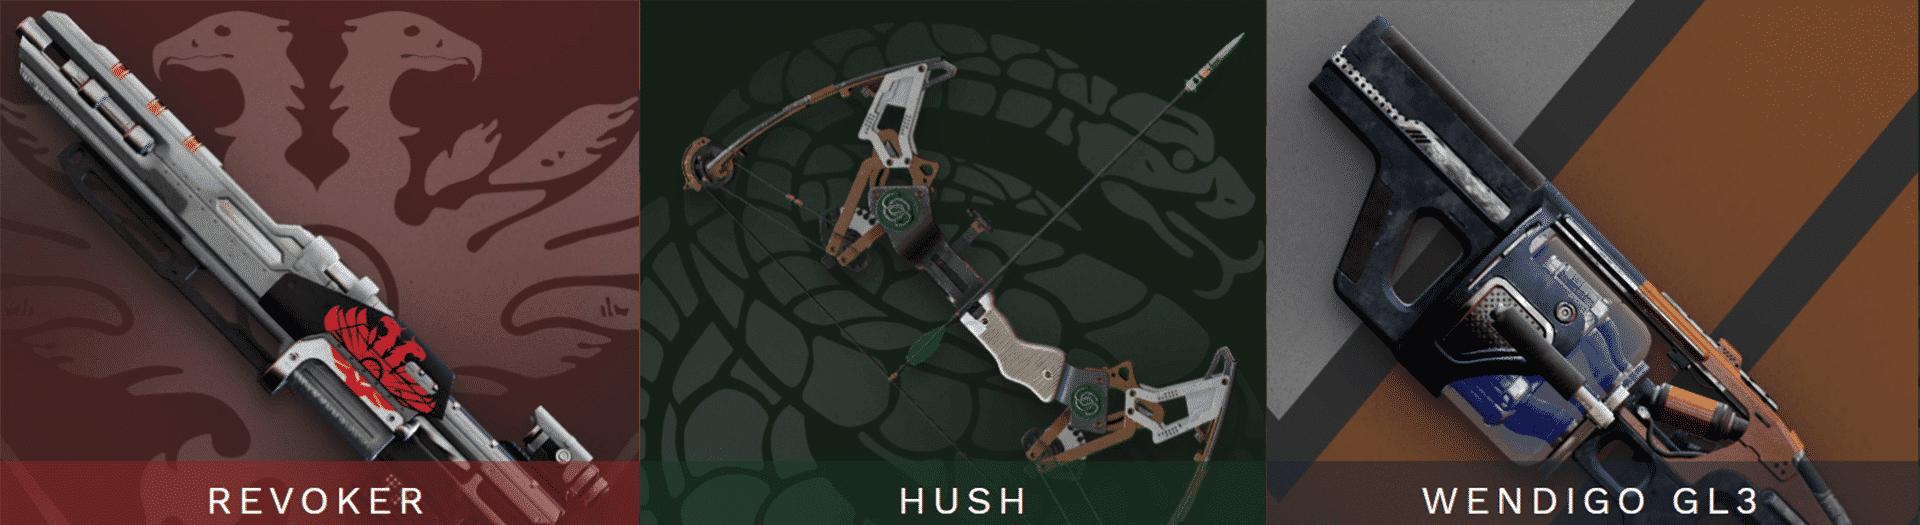 hush carry recov